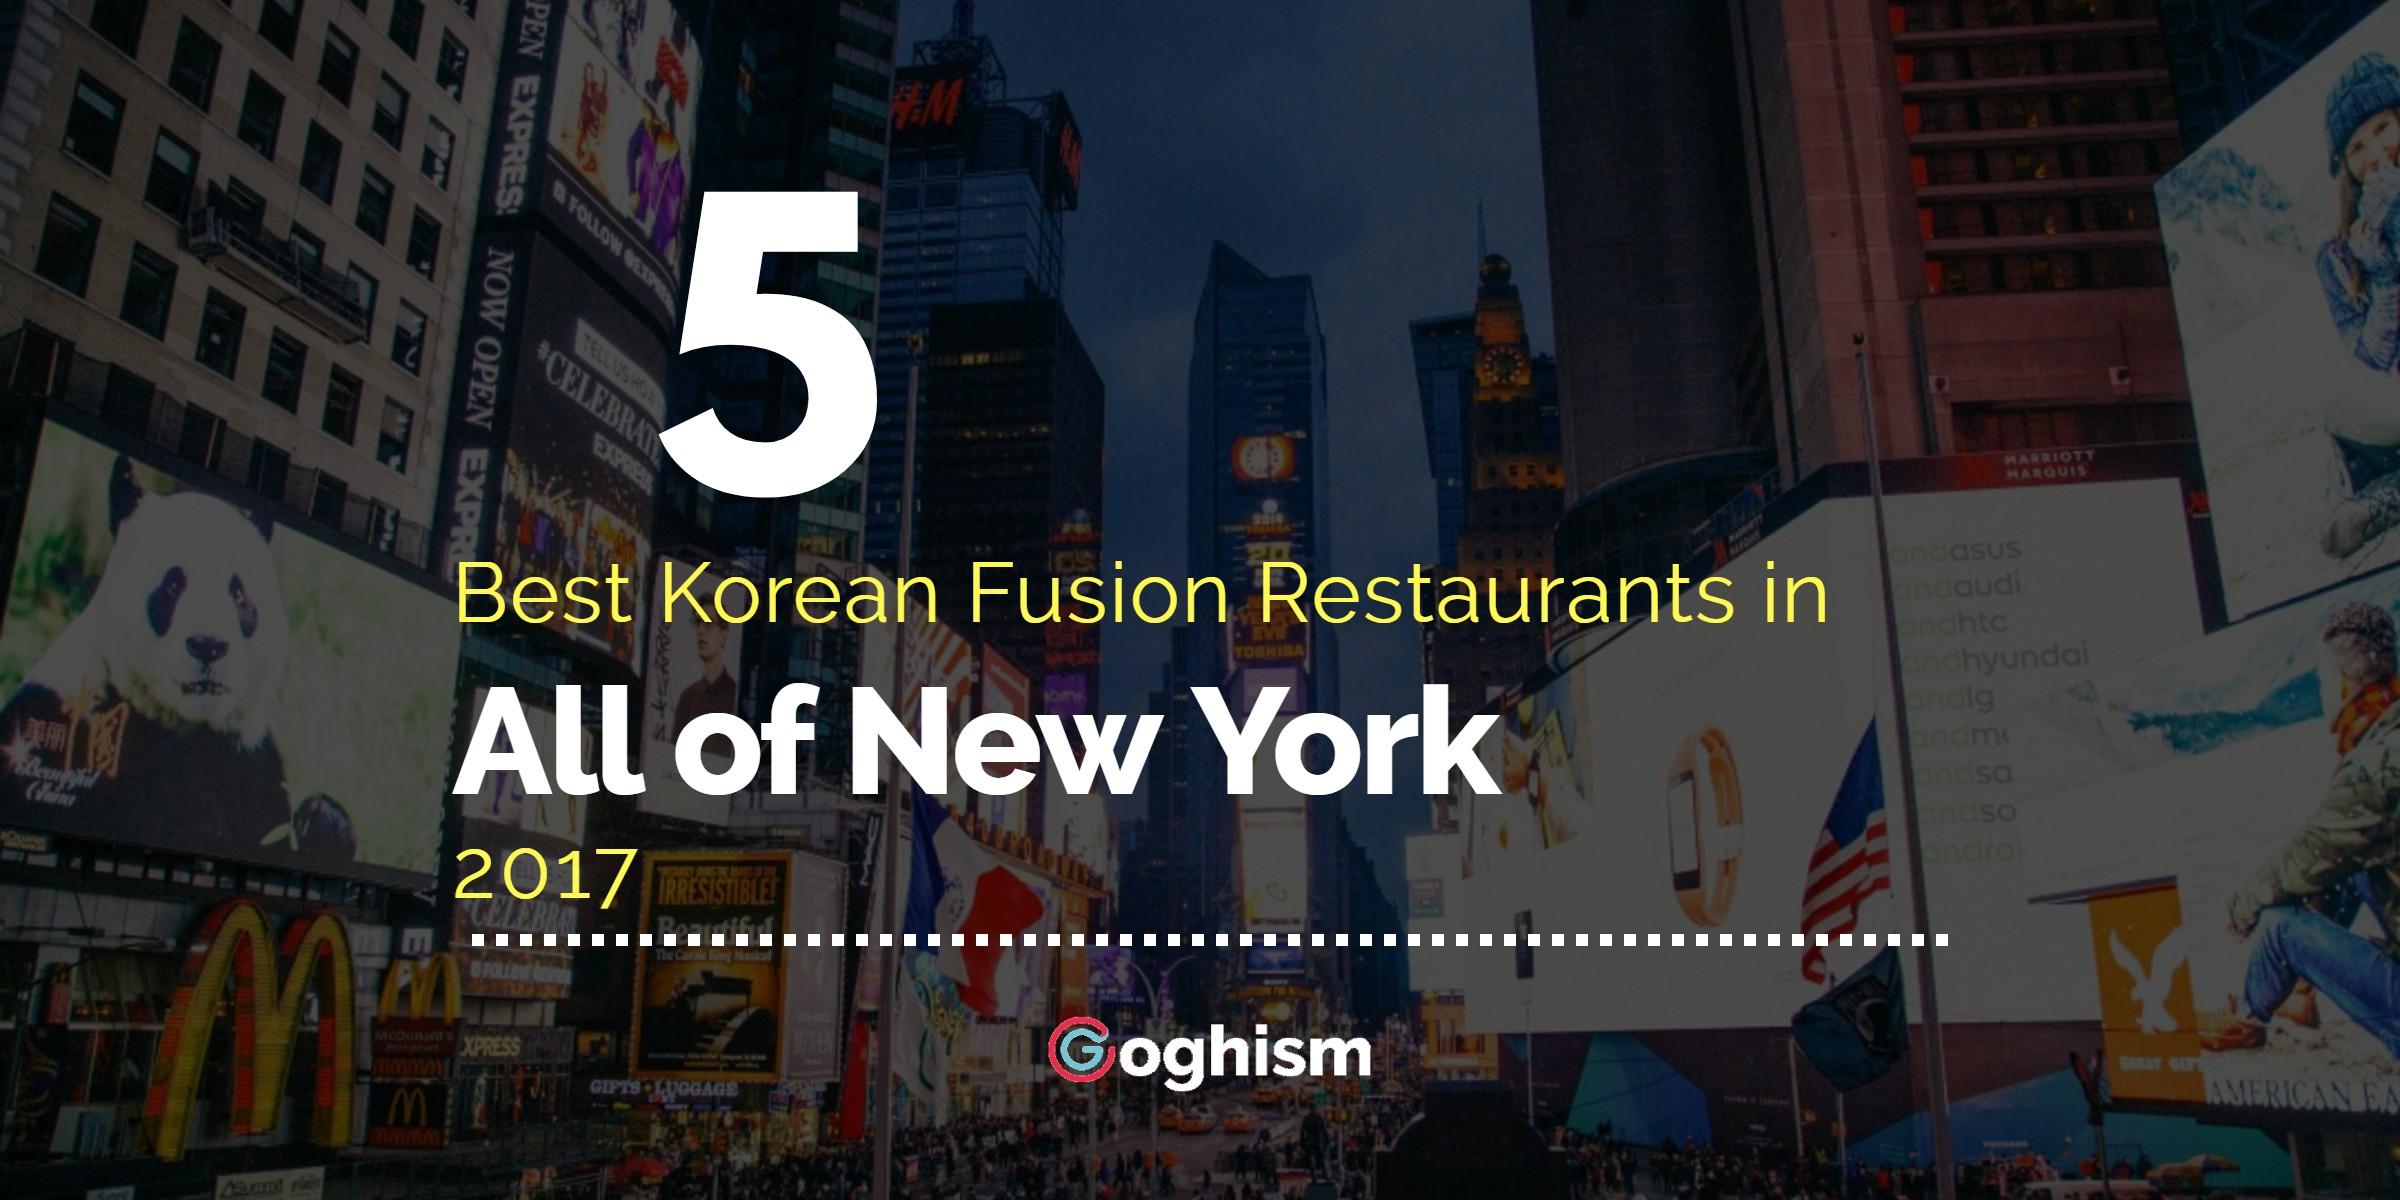 Korean dating in new york